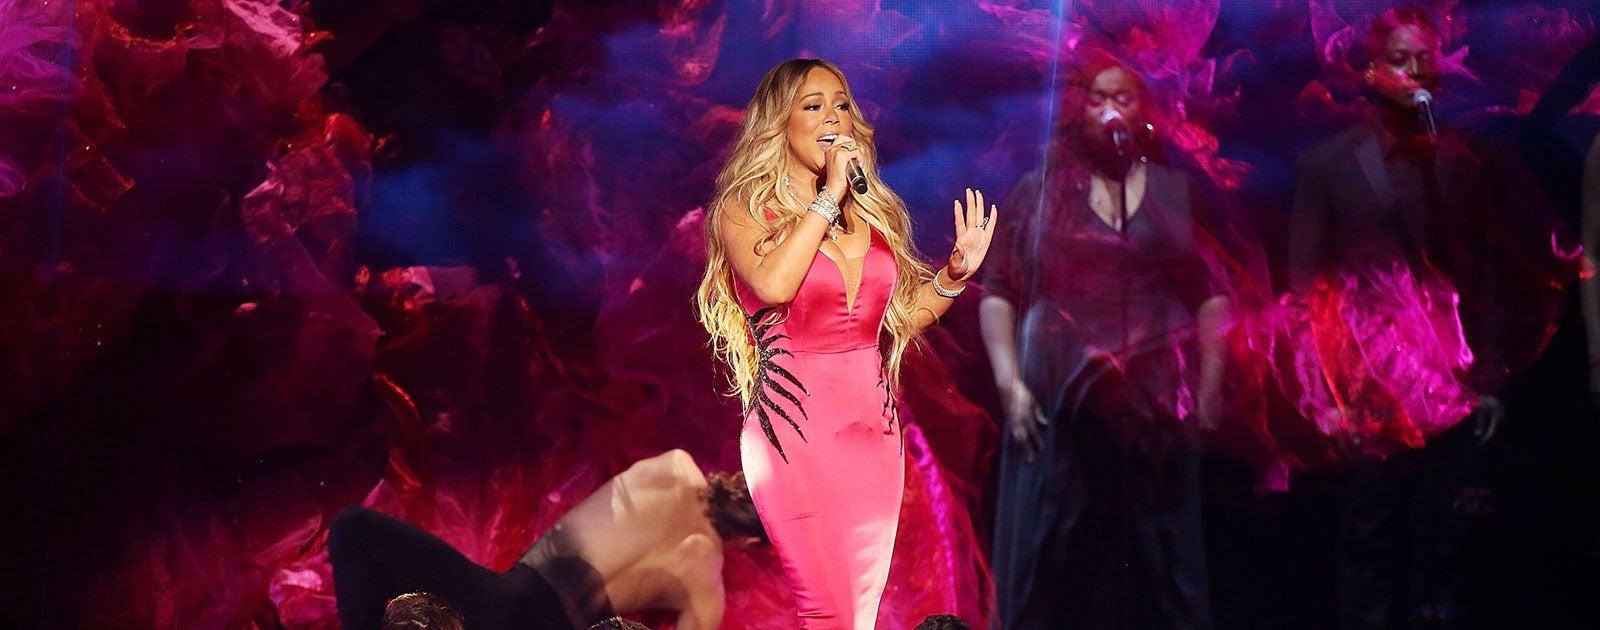 2019 Mariah Carey naked (38 photos), Topless, Leaked, Feet, underwear 2006